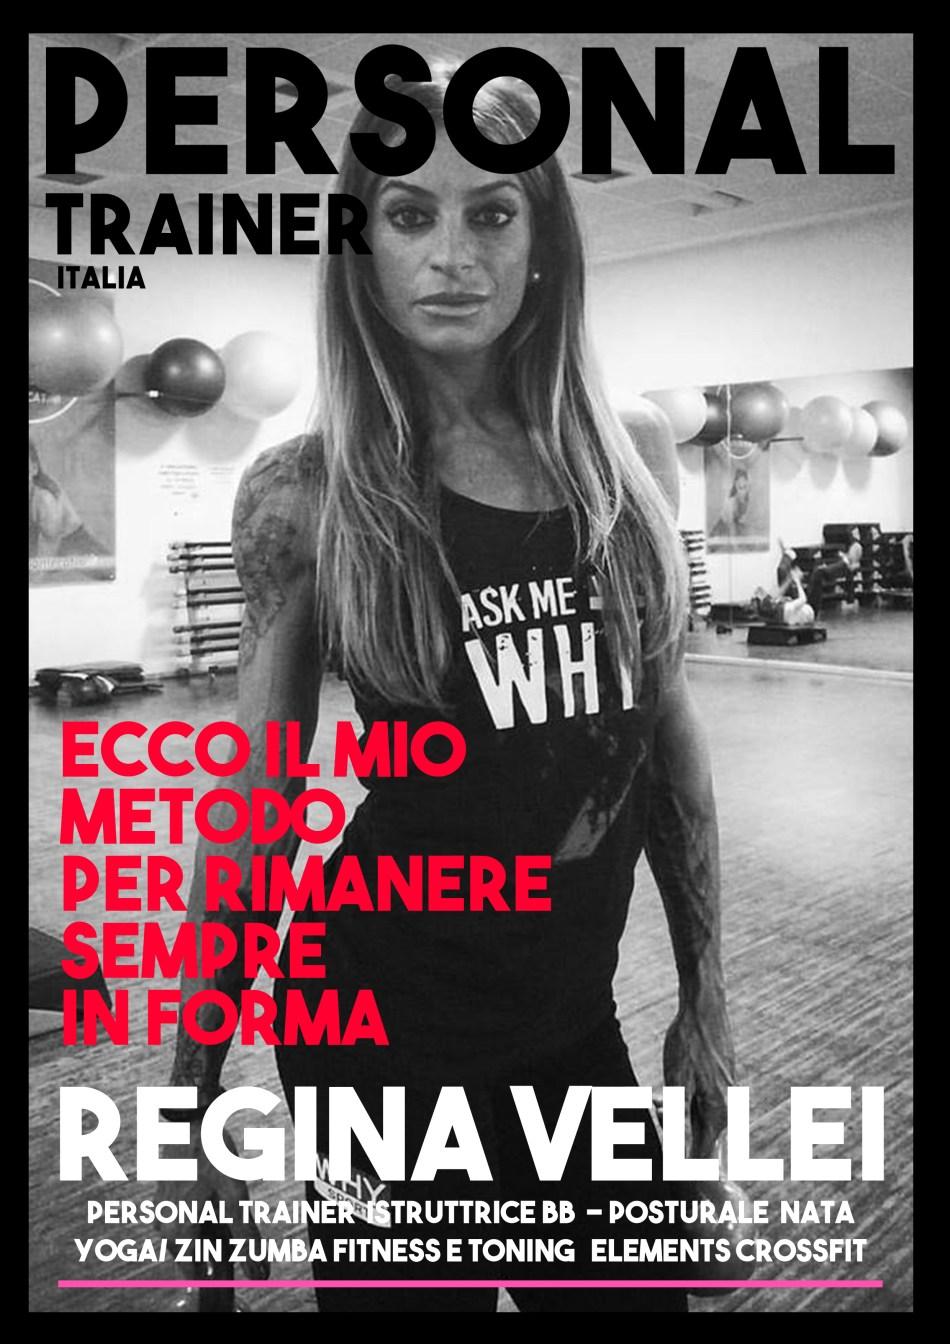 Personal Trainer Italia